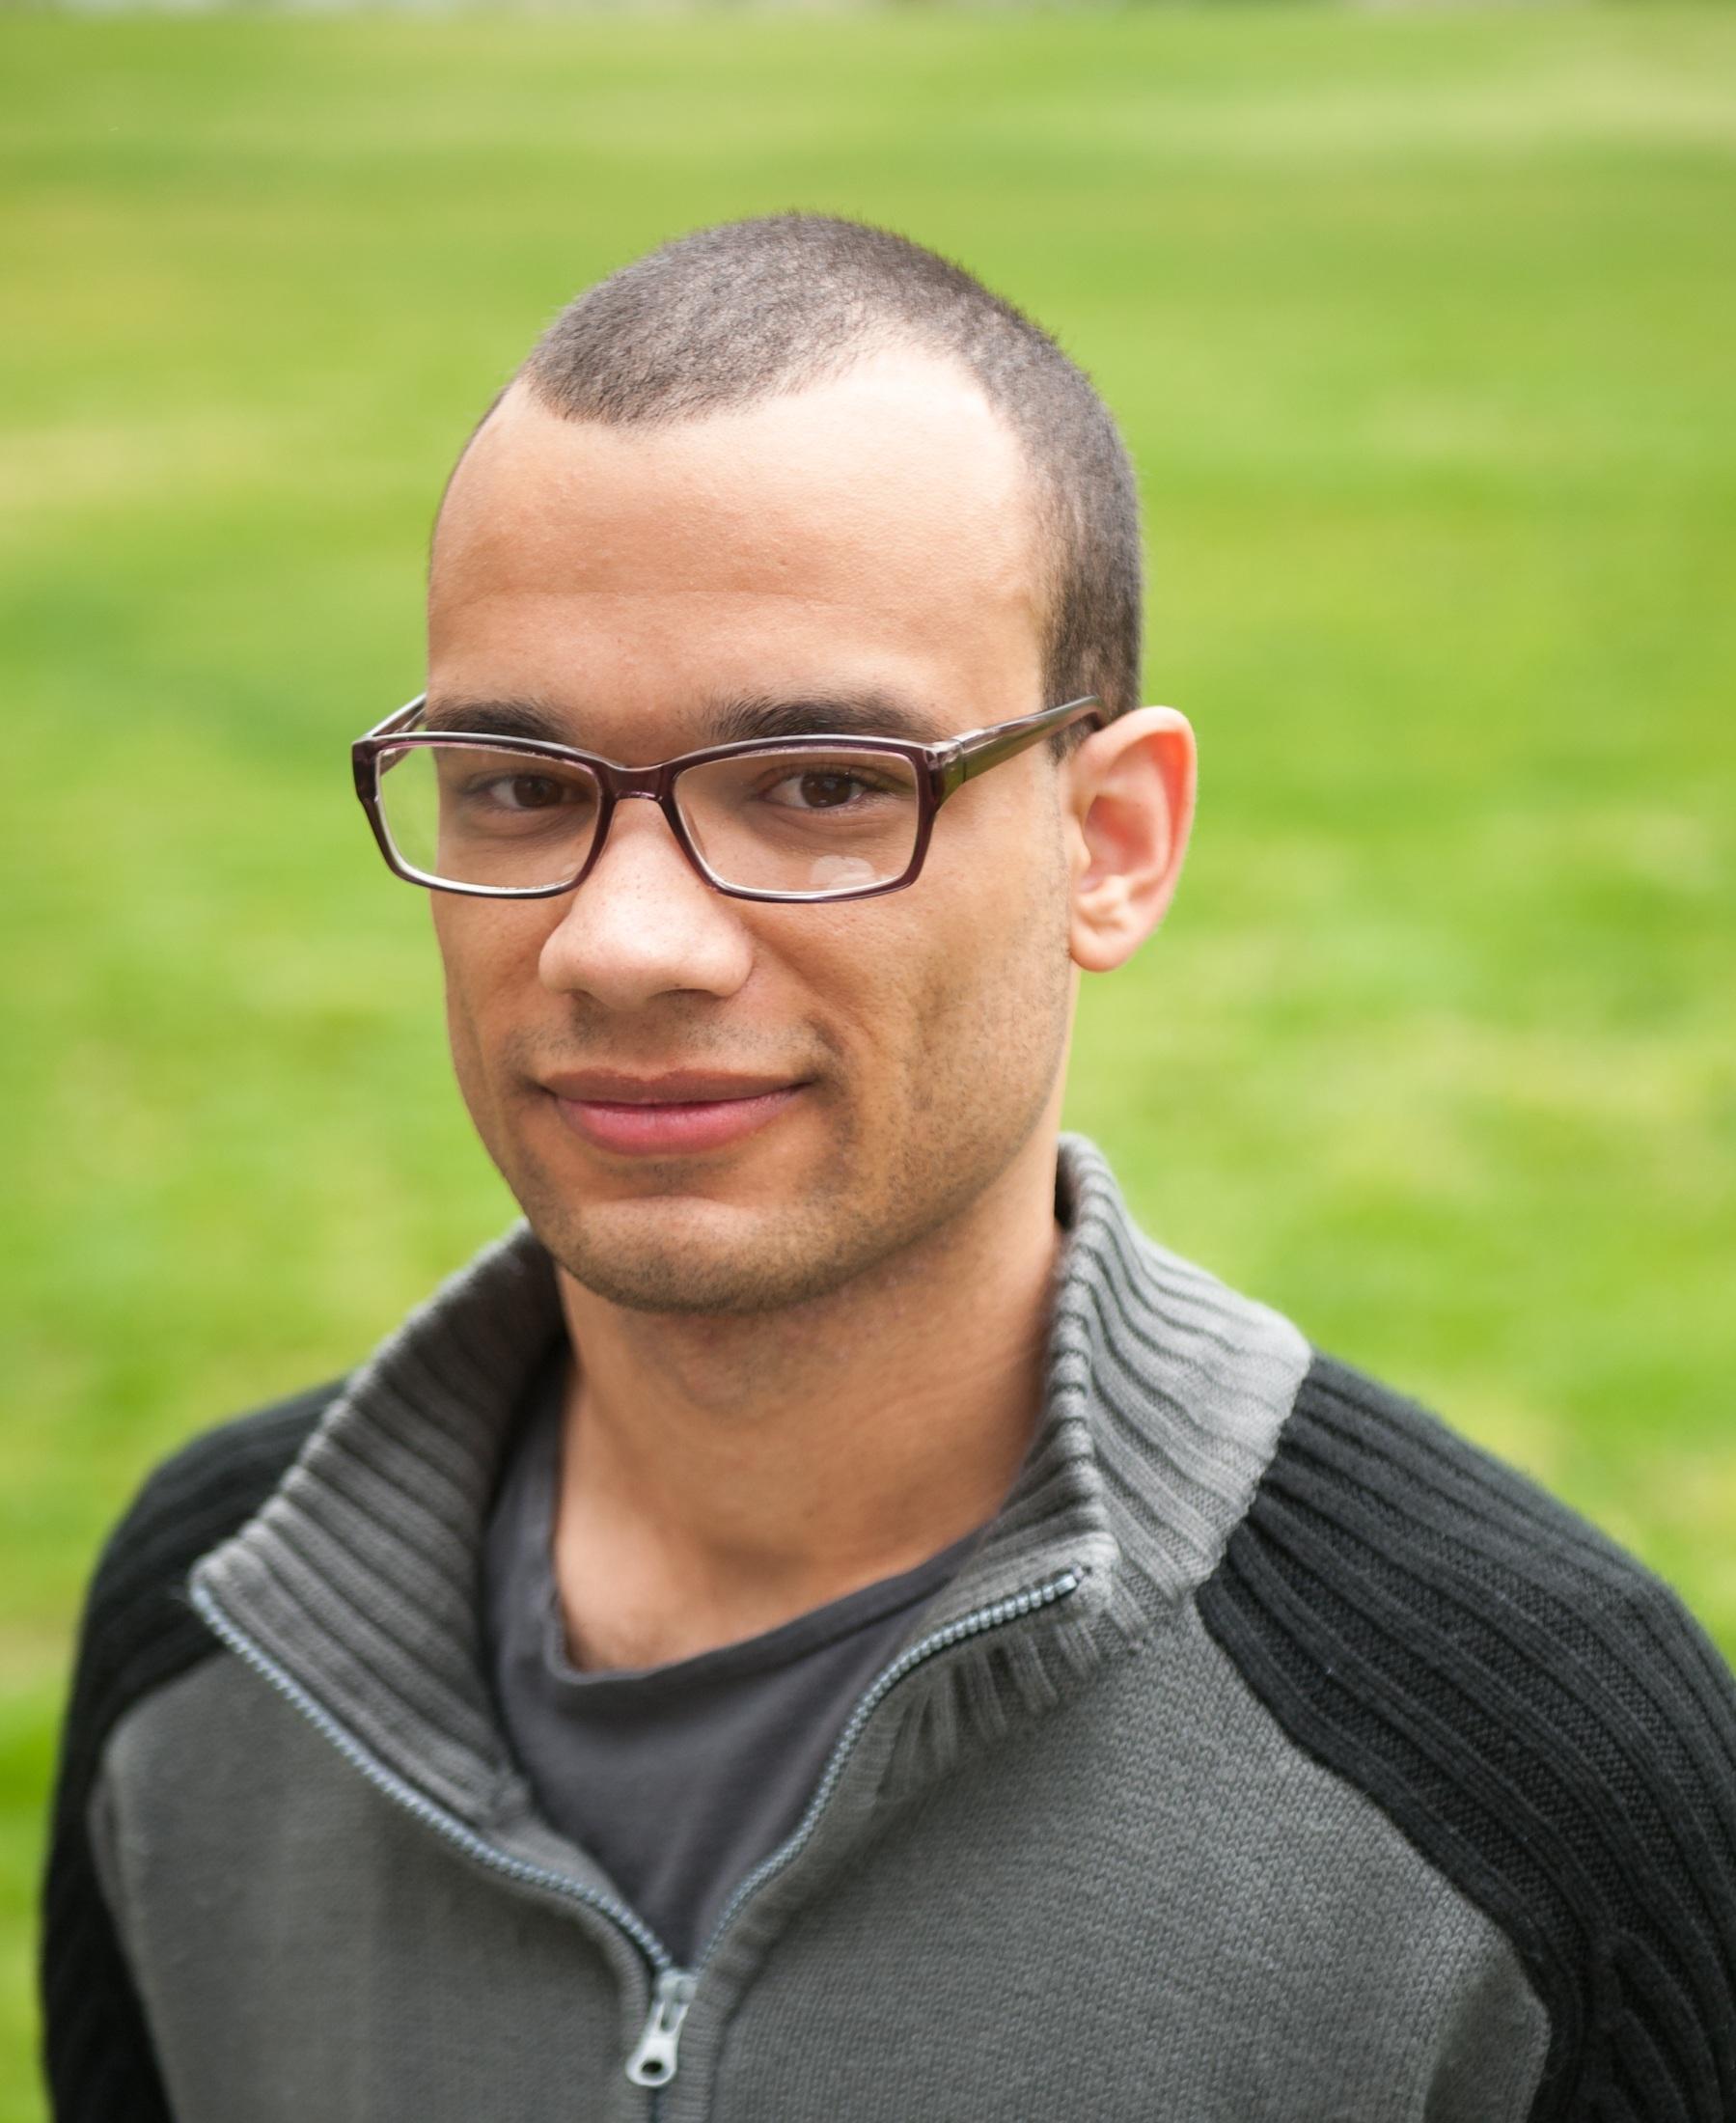 PhD Student, IMP Program